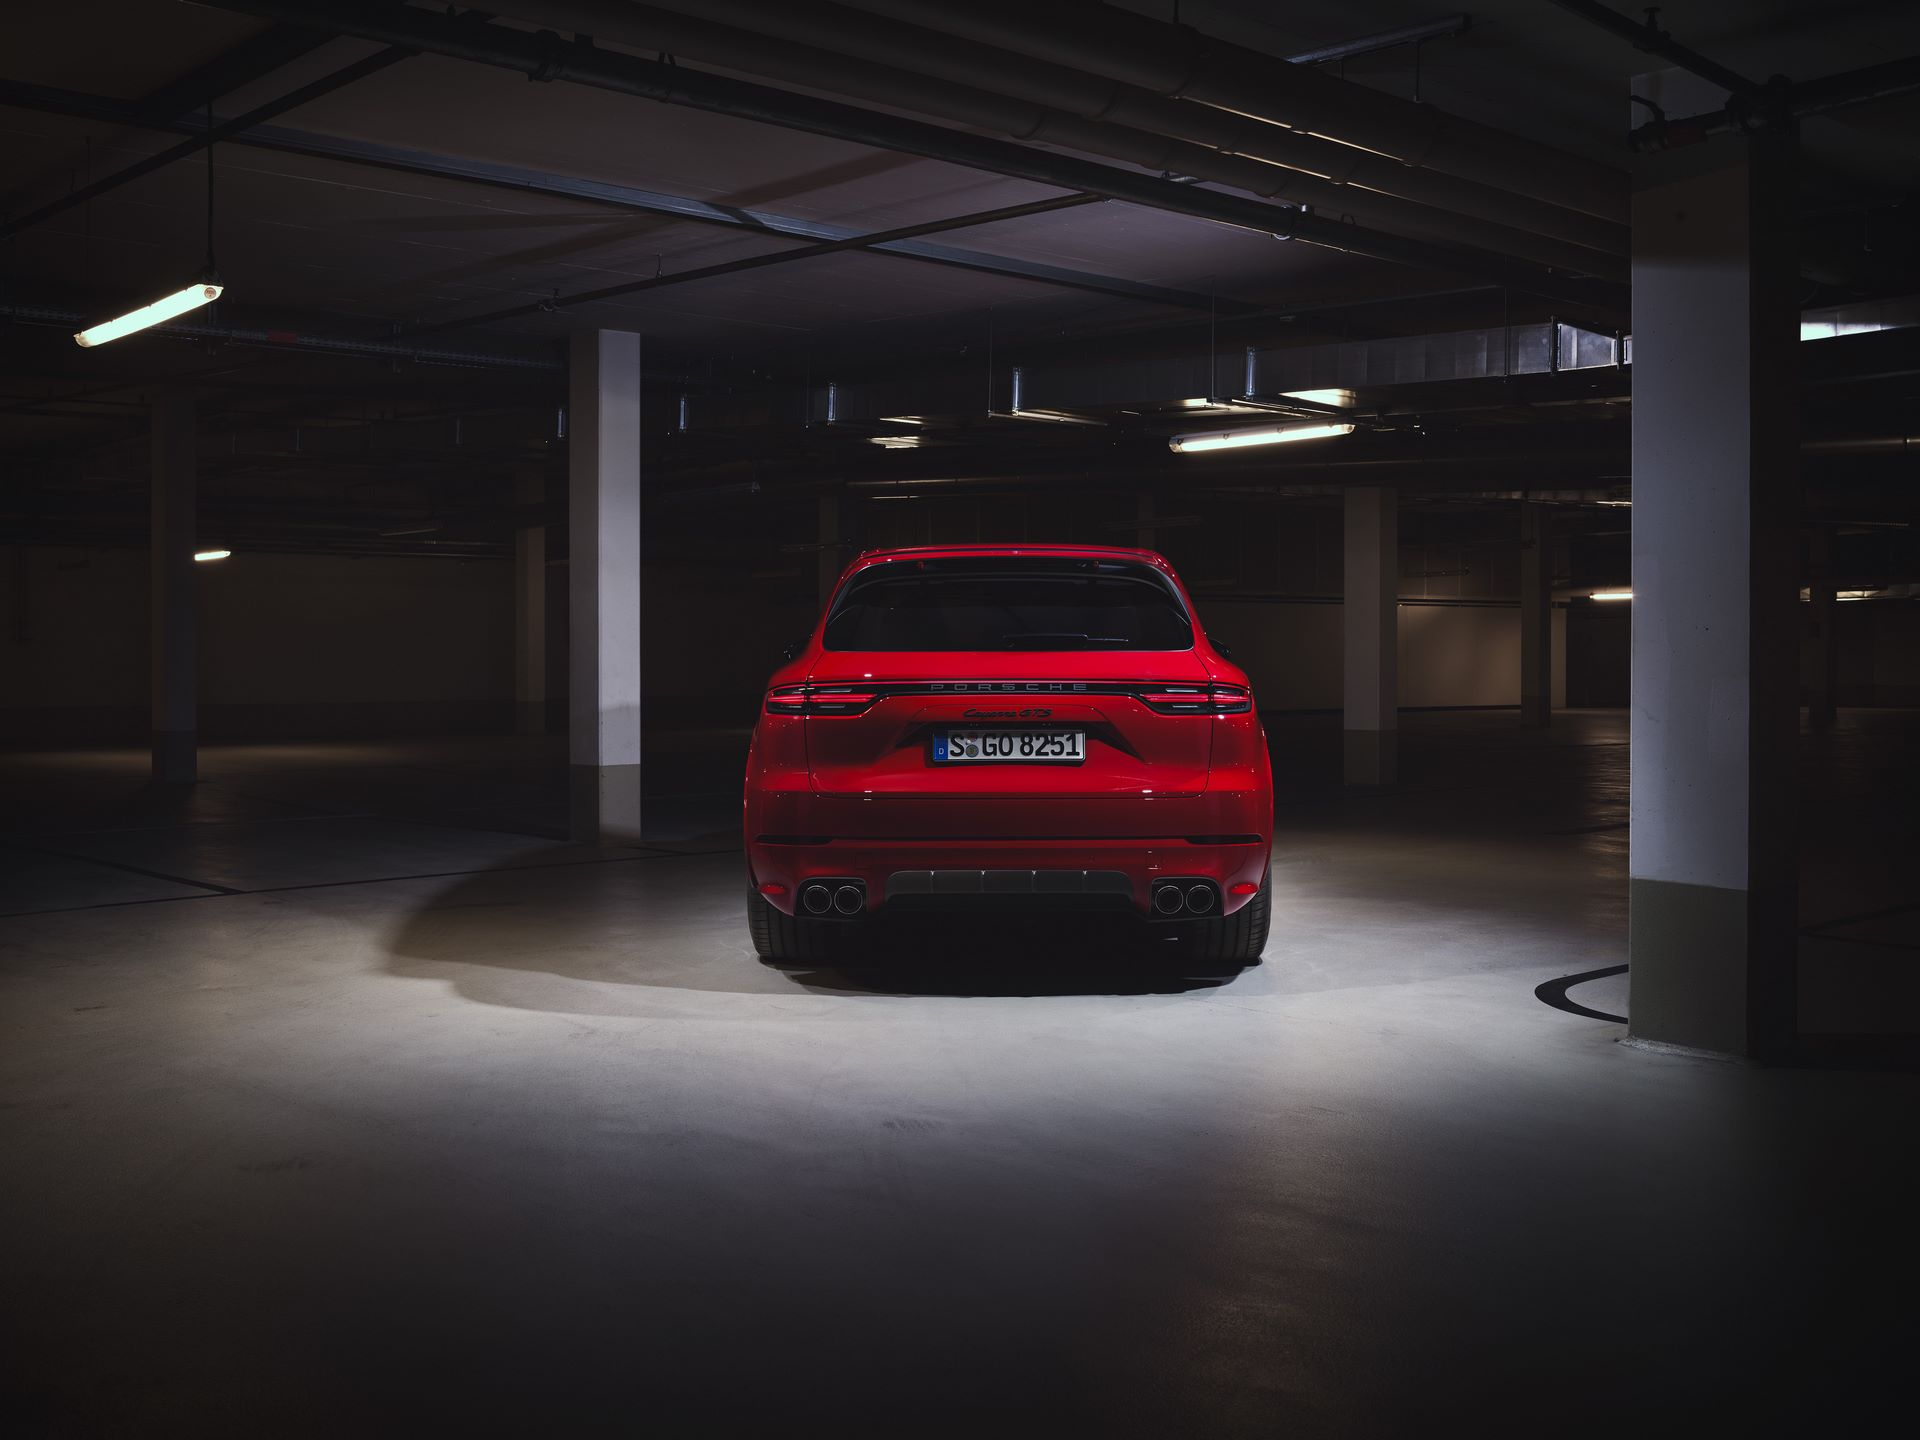 Porsche-Cayenne-GTS-and-Cayenne-GTS-Coupe-2021-18